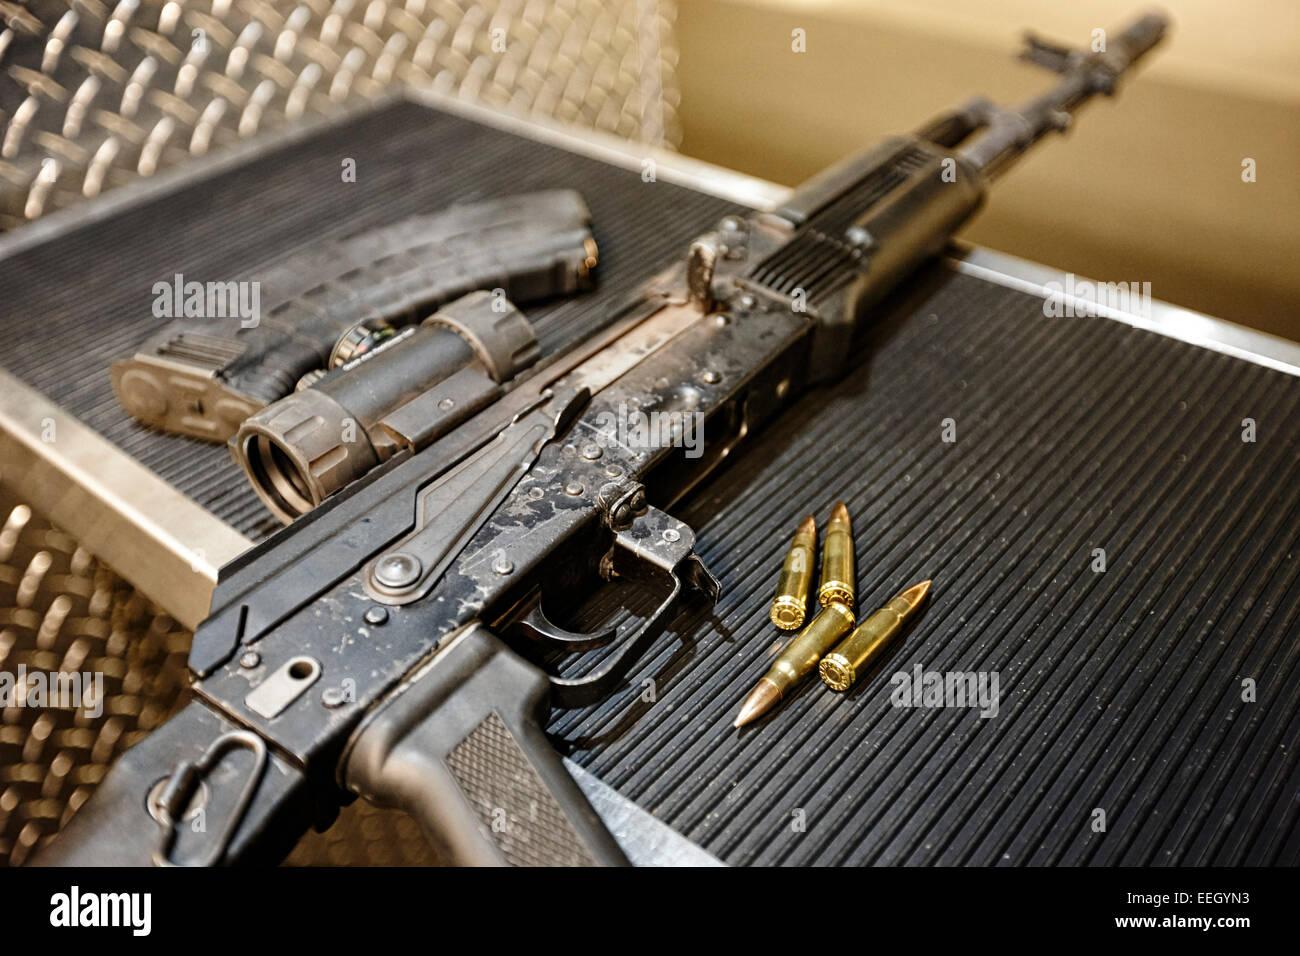 Ak47 Gun Stock Photos & Ak47 Gun Stock Images - Alamy